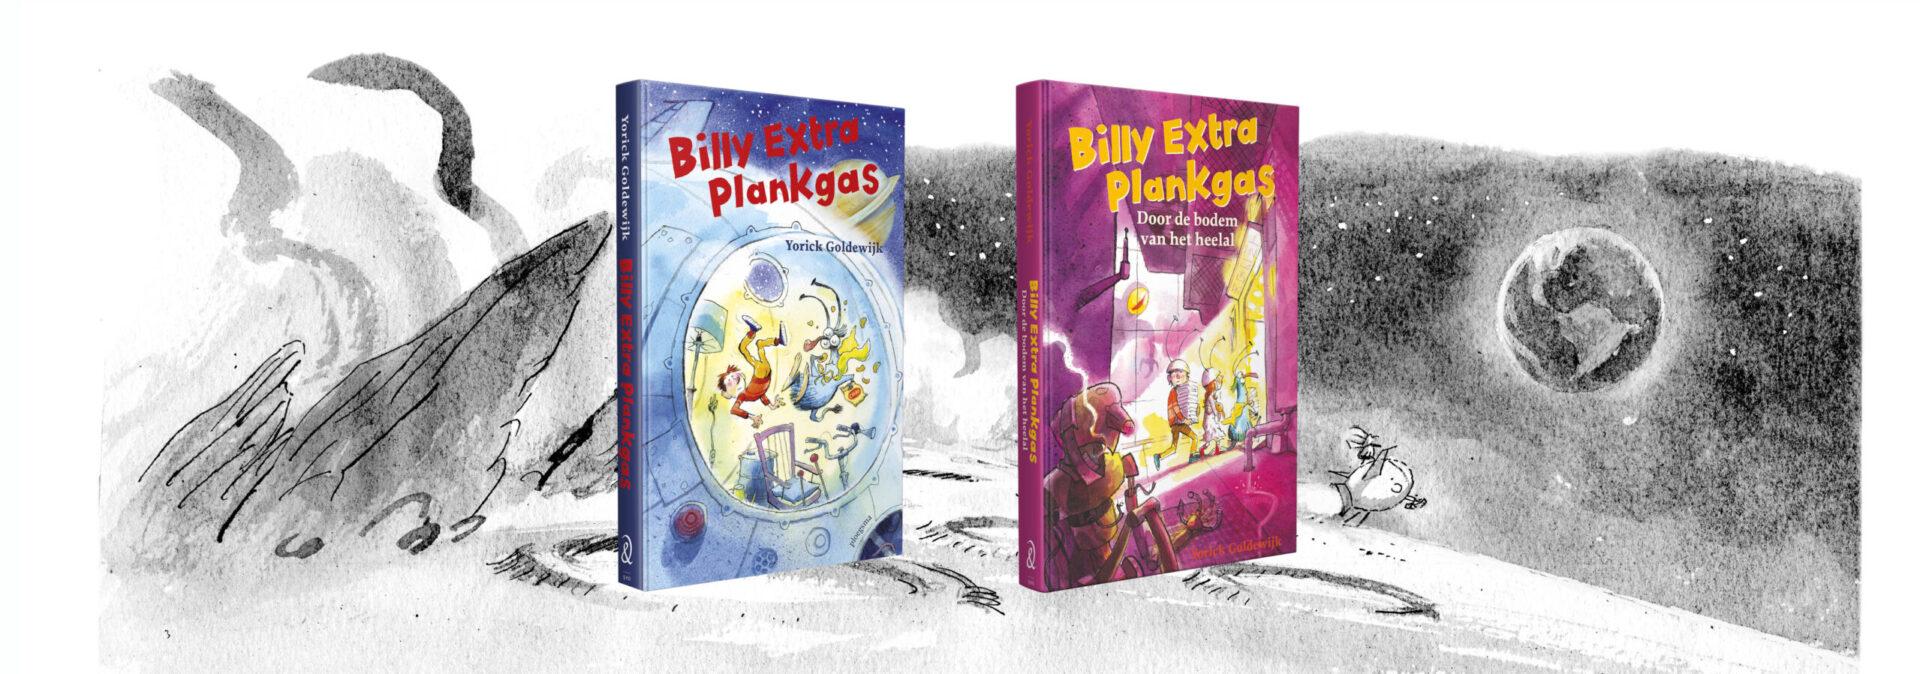 Billy Extra Plankgas - Yorick Goldewijk - Kees de Boer